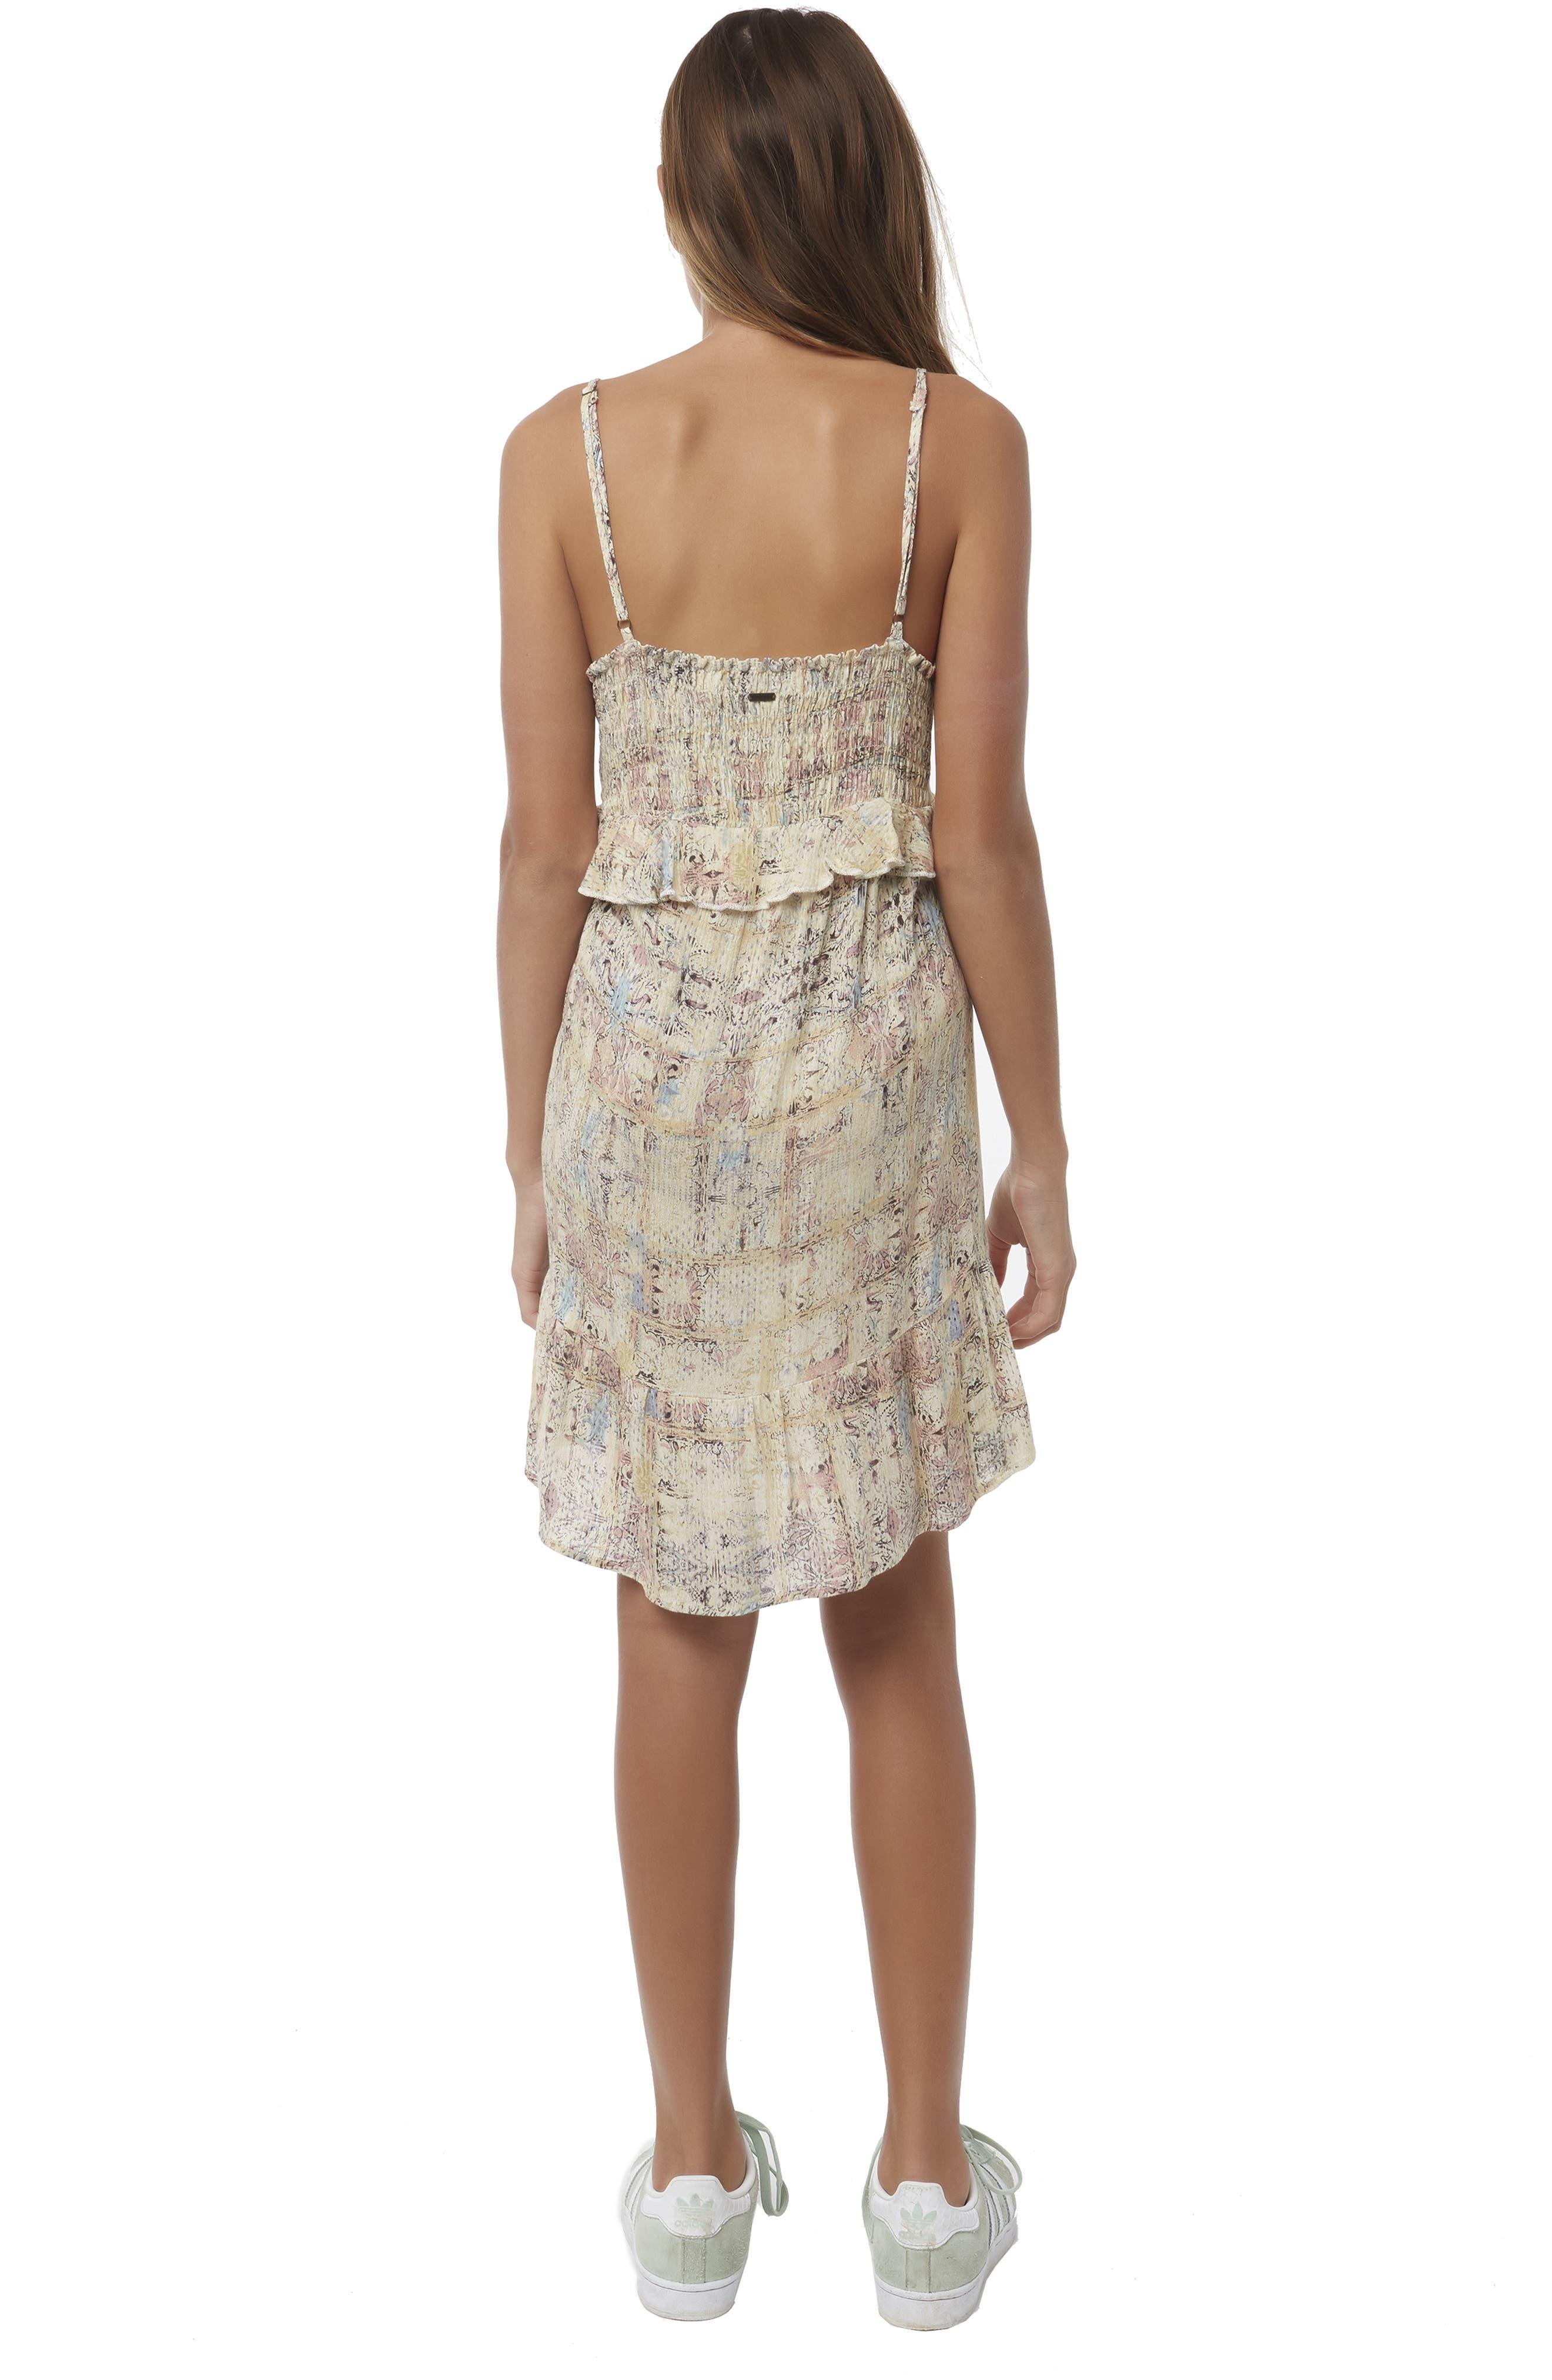 O'NEILL, Lithia Peplum High/Low Dress, Alternate thumbnail 3, color, 994